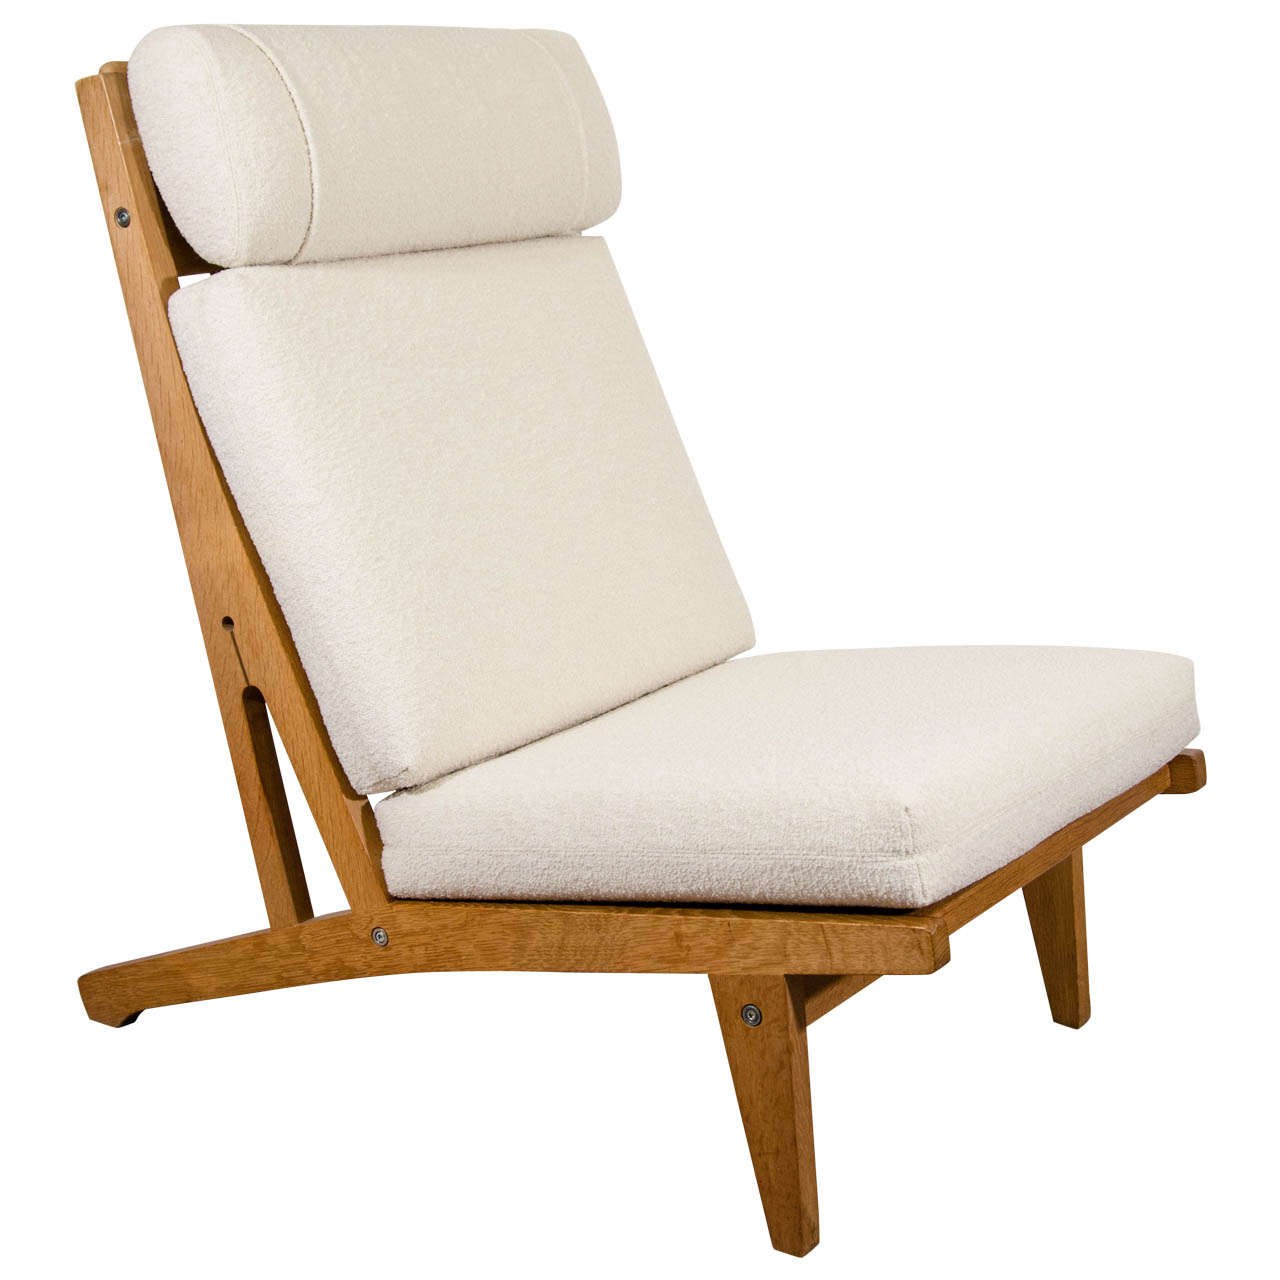 Beau A Mid Century Hans Wegner Lounge Chair By Getama For Sale